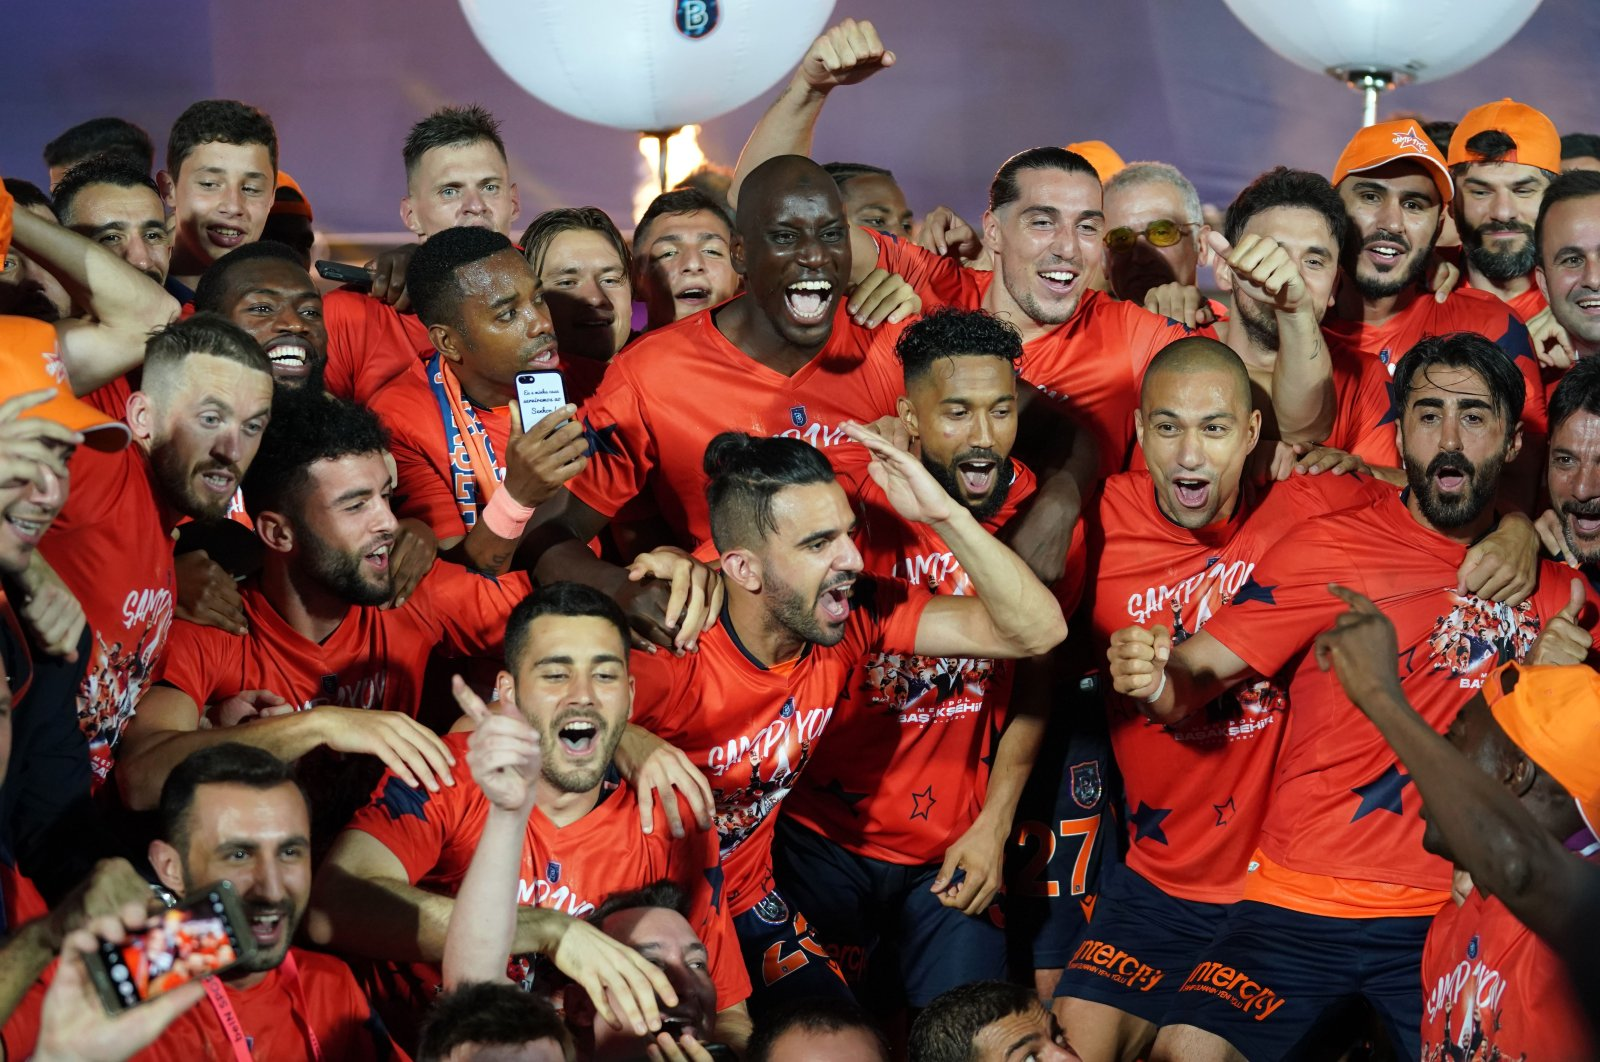 Başakşehir wins Süper Lig title for 1st time